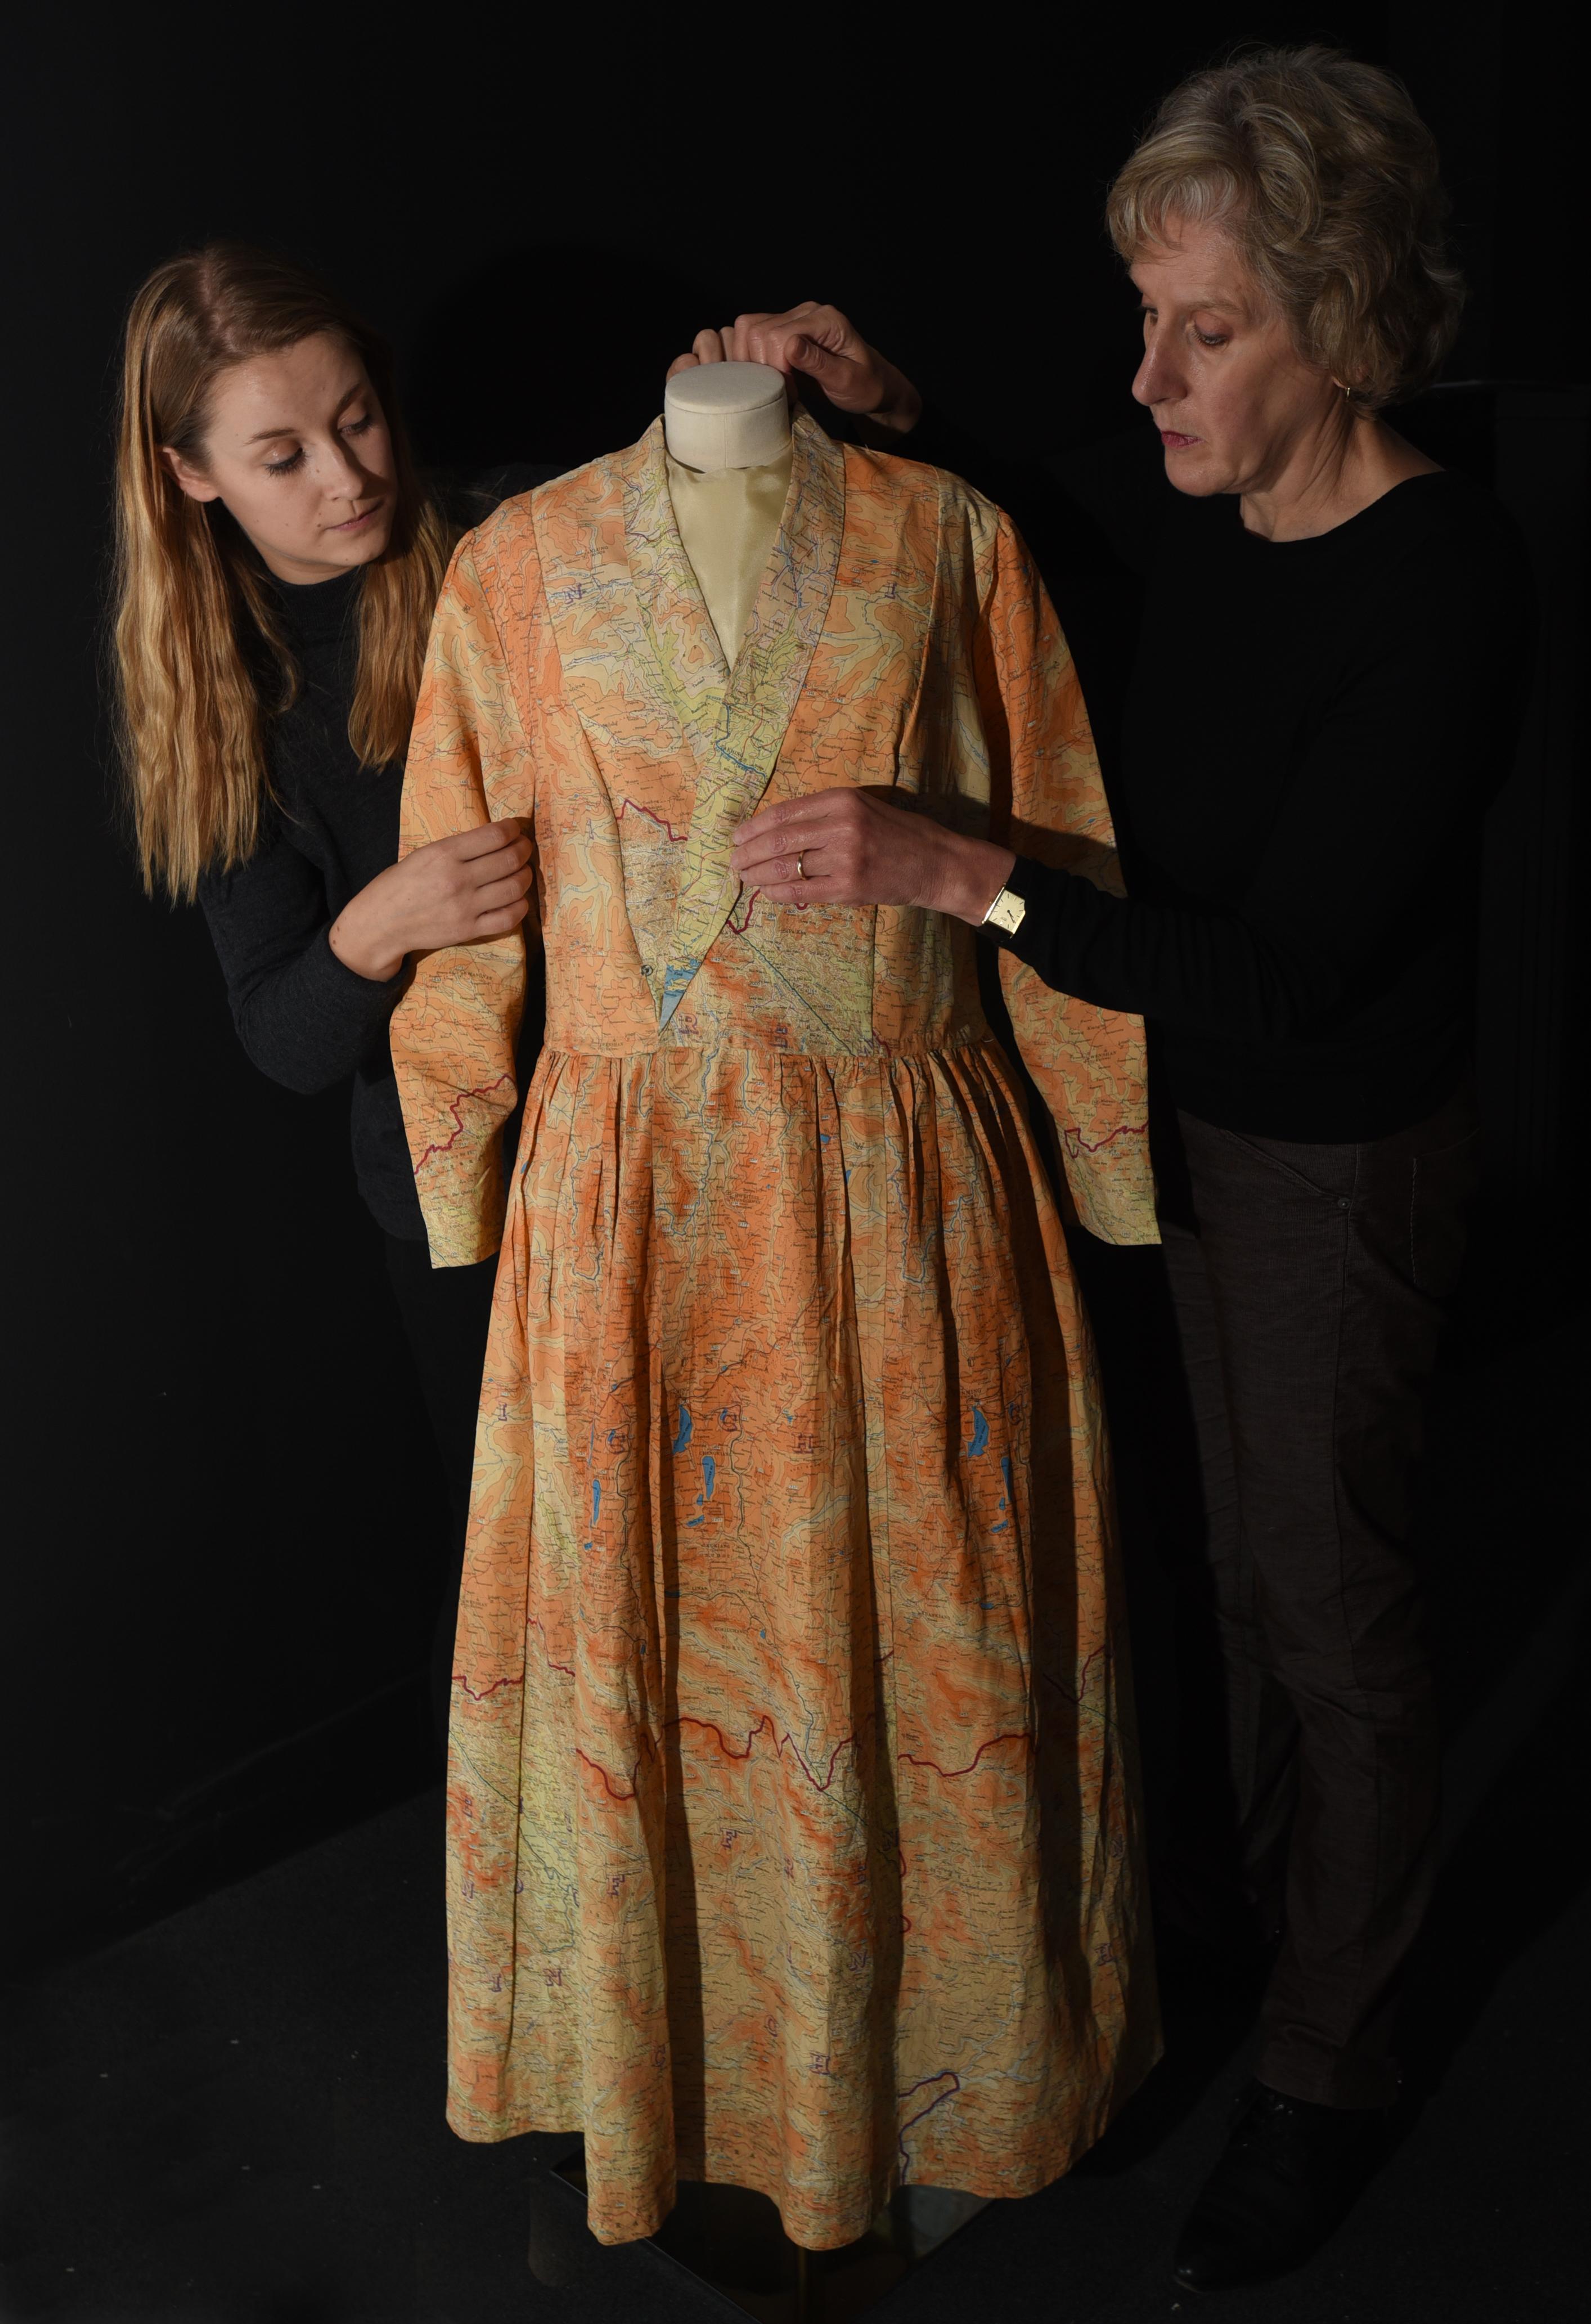 Silk maps dress. British Library